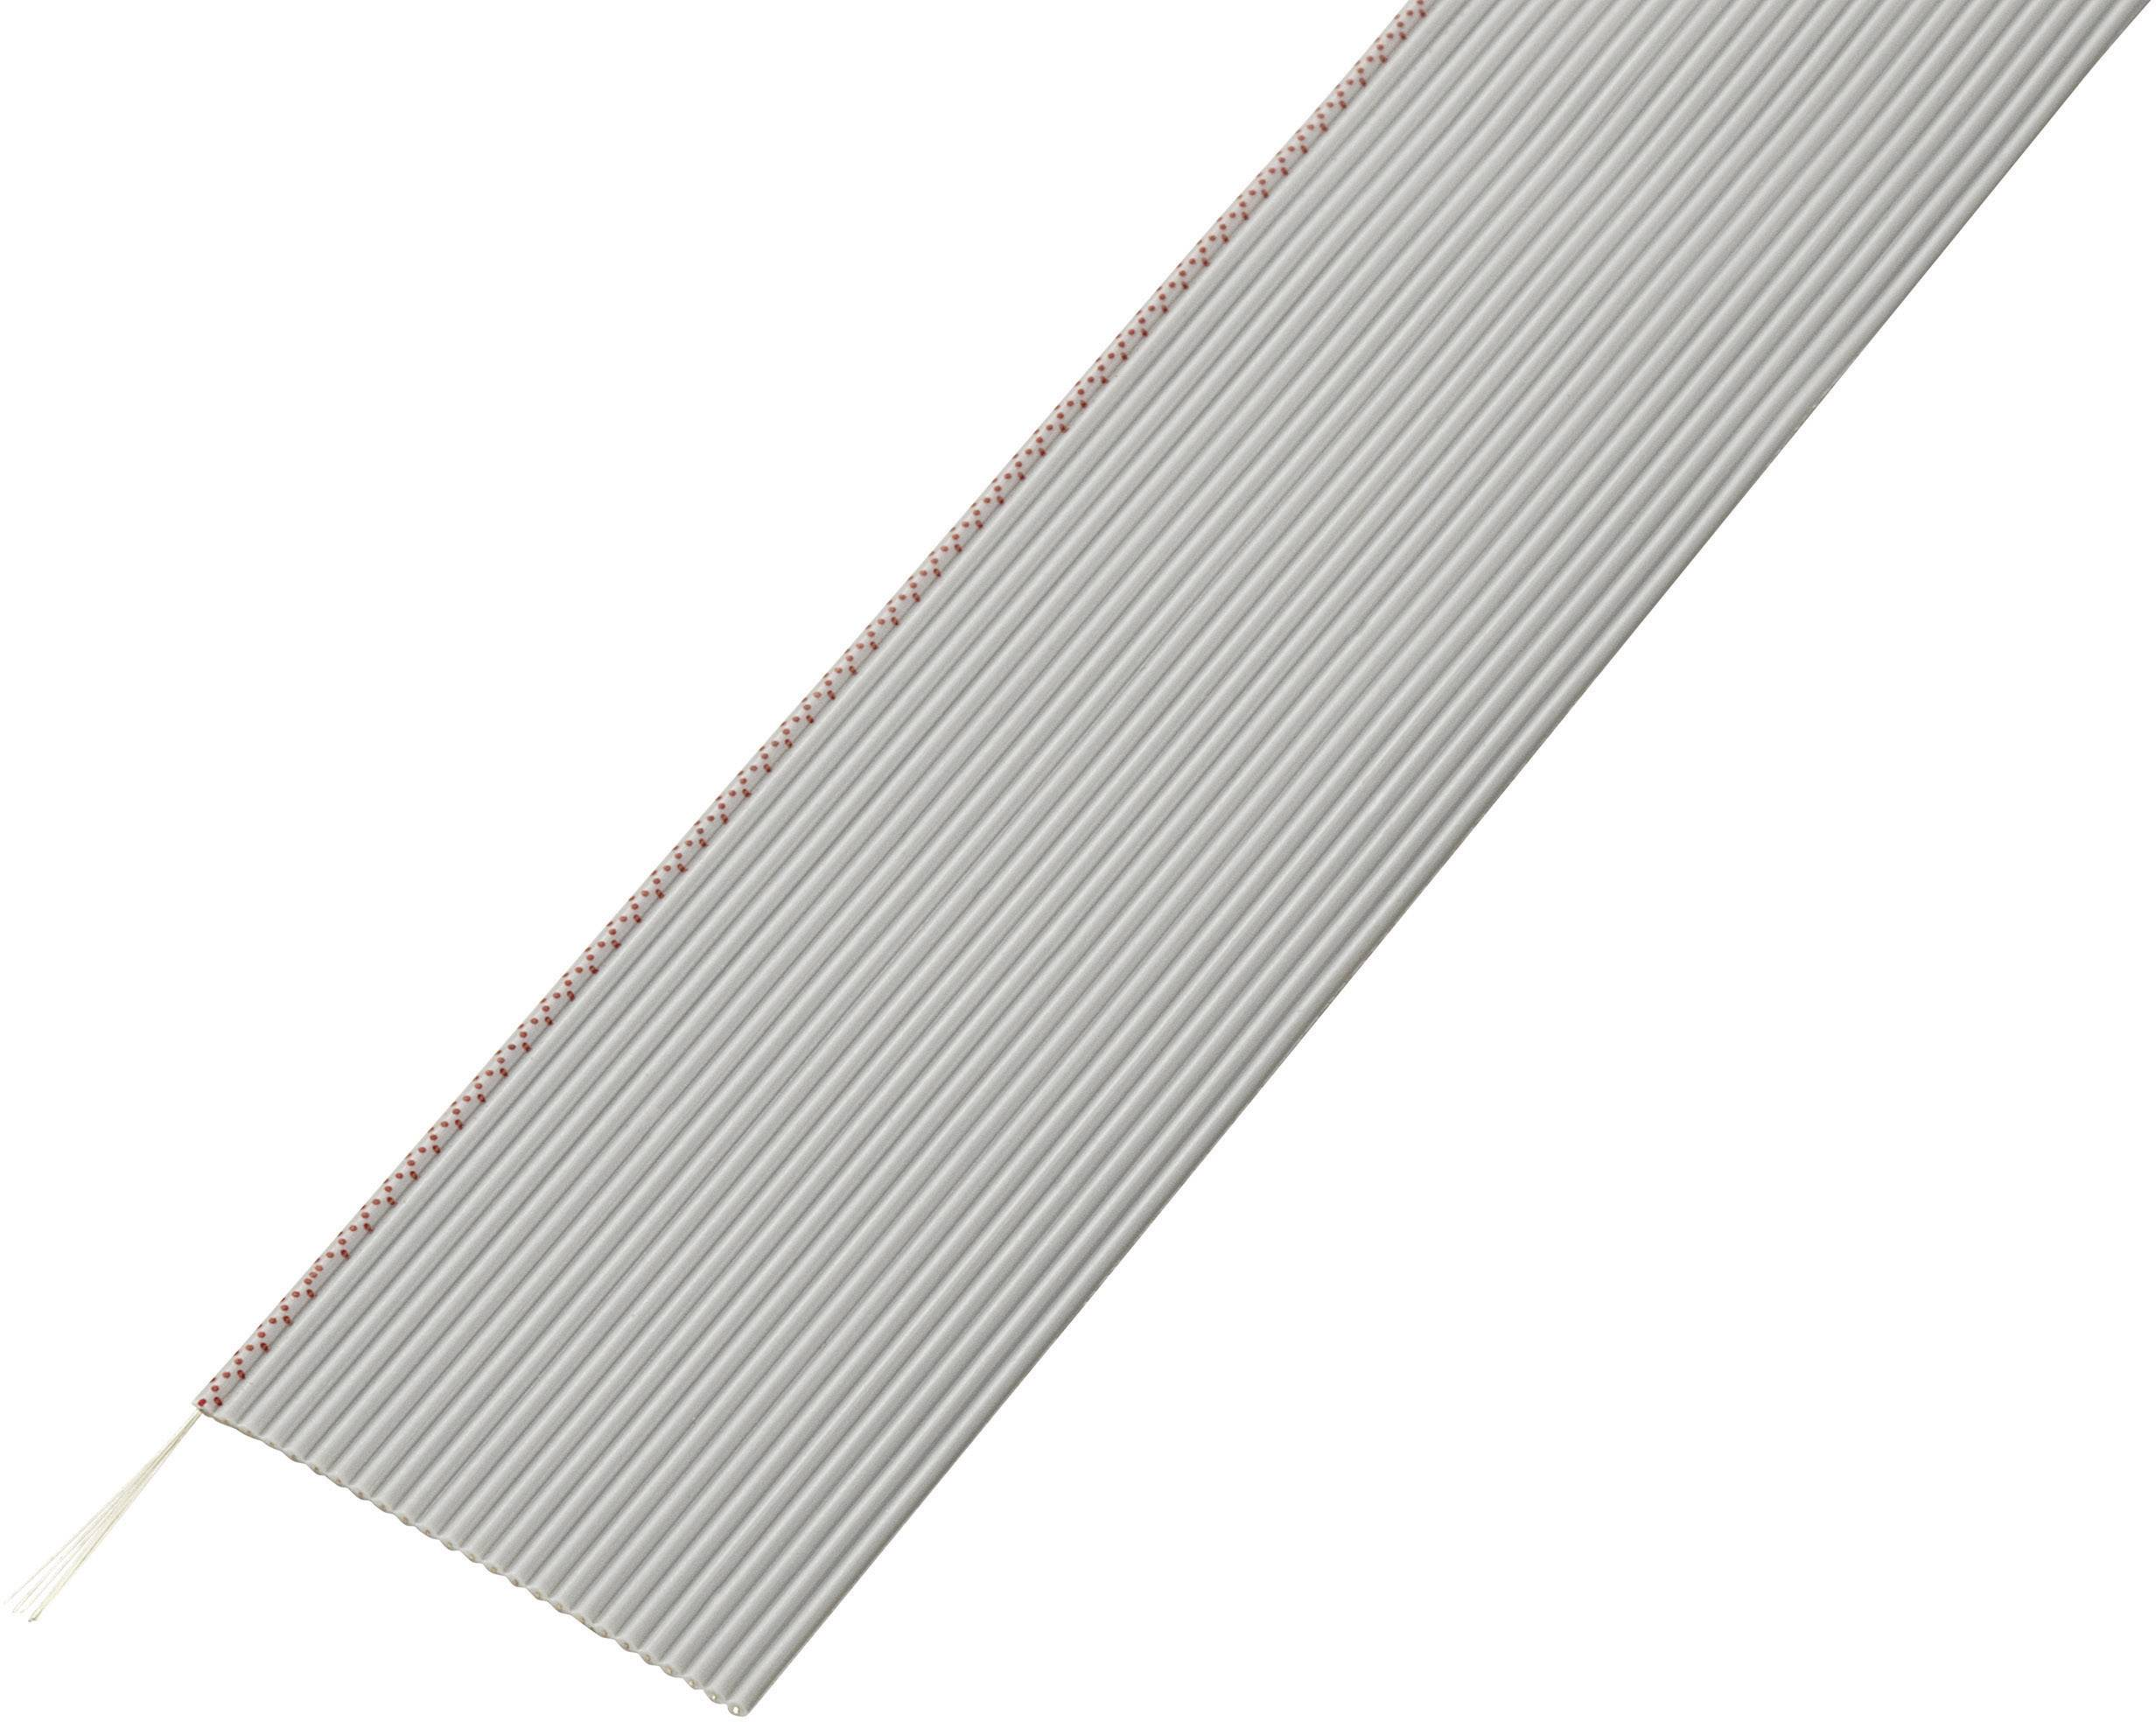 Plochý kabel Flachband cable 25P (SH1998C203), nestíněný, 30.5 m, šedá